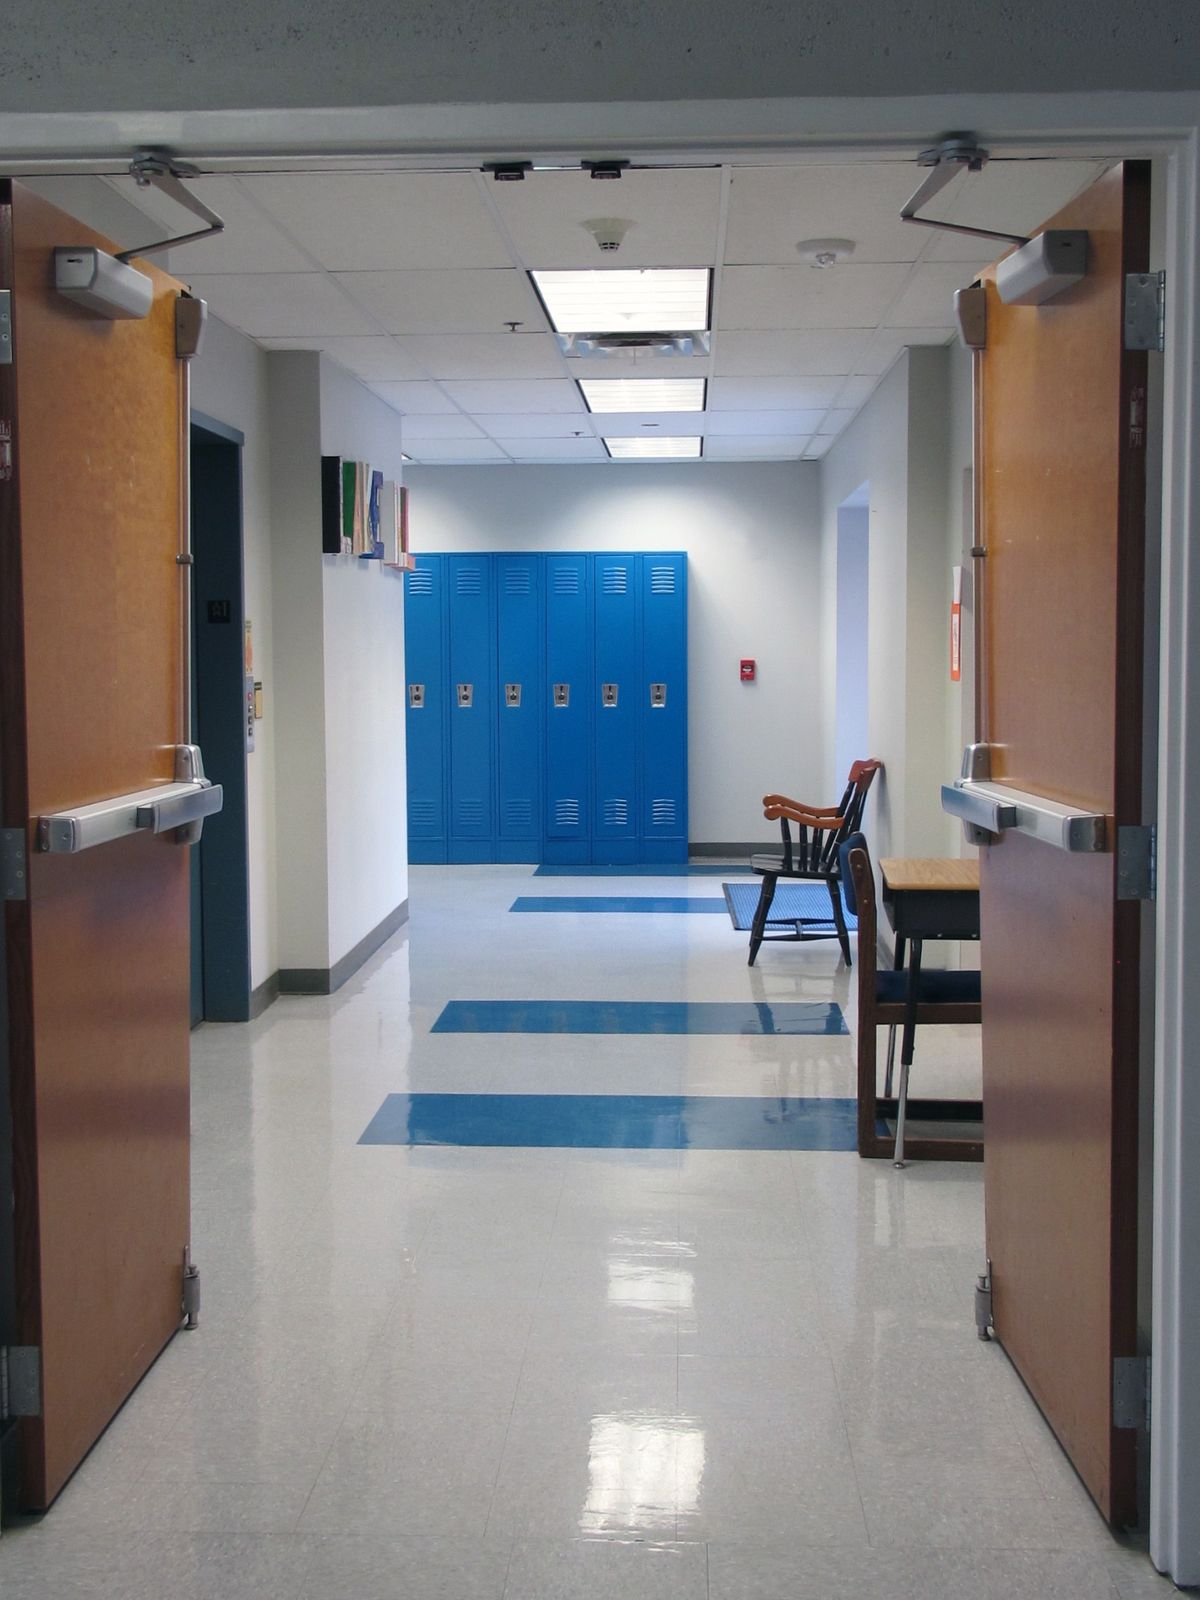 Lakehill School Photo Video Shoot Location Dallas14.jpg